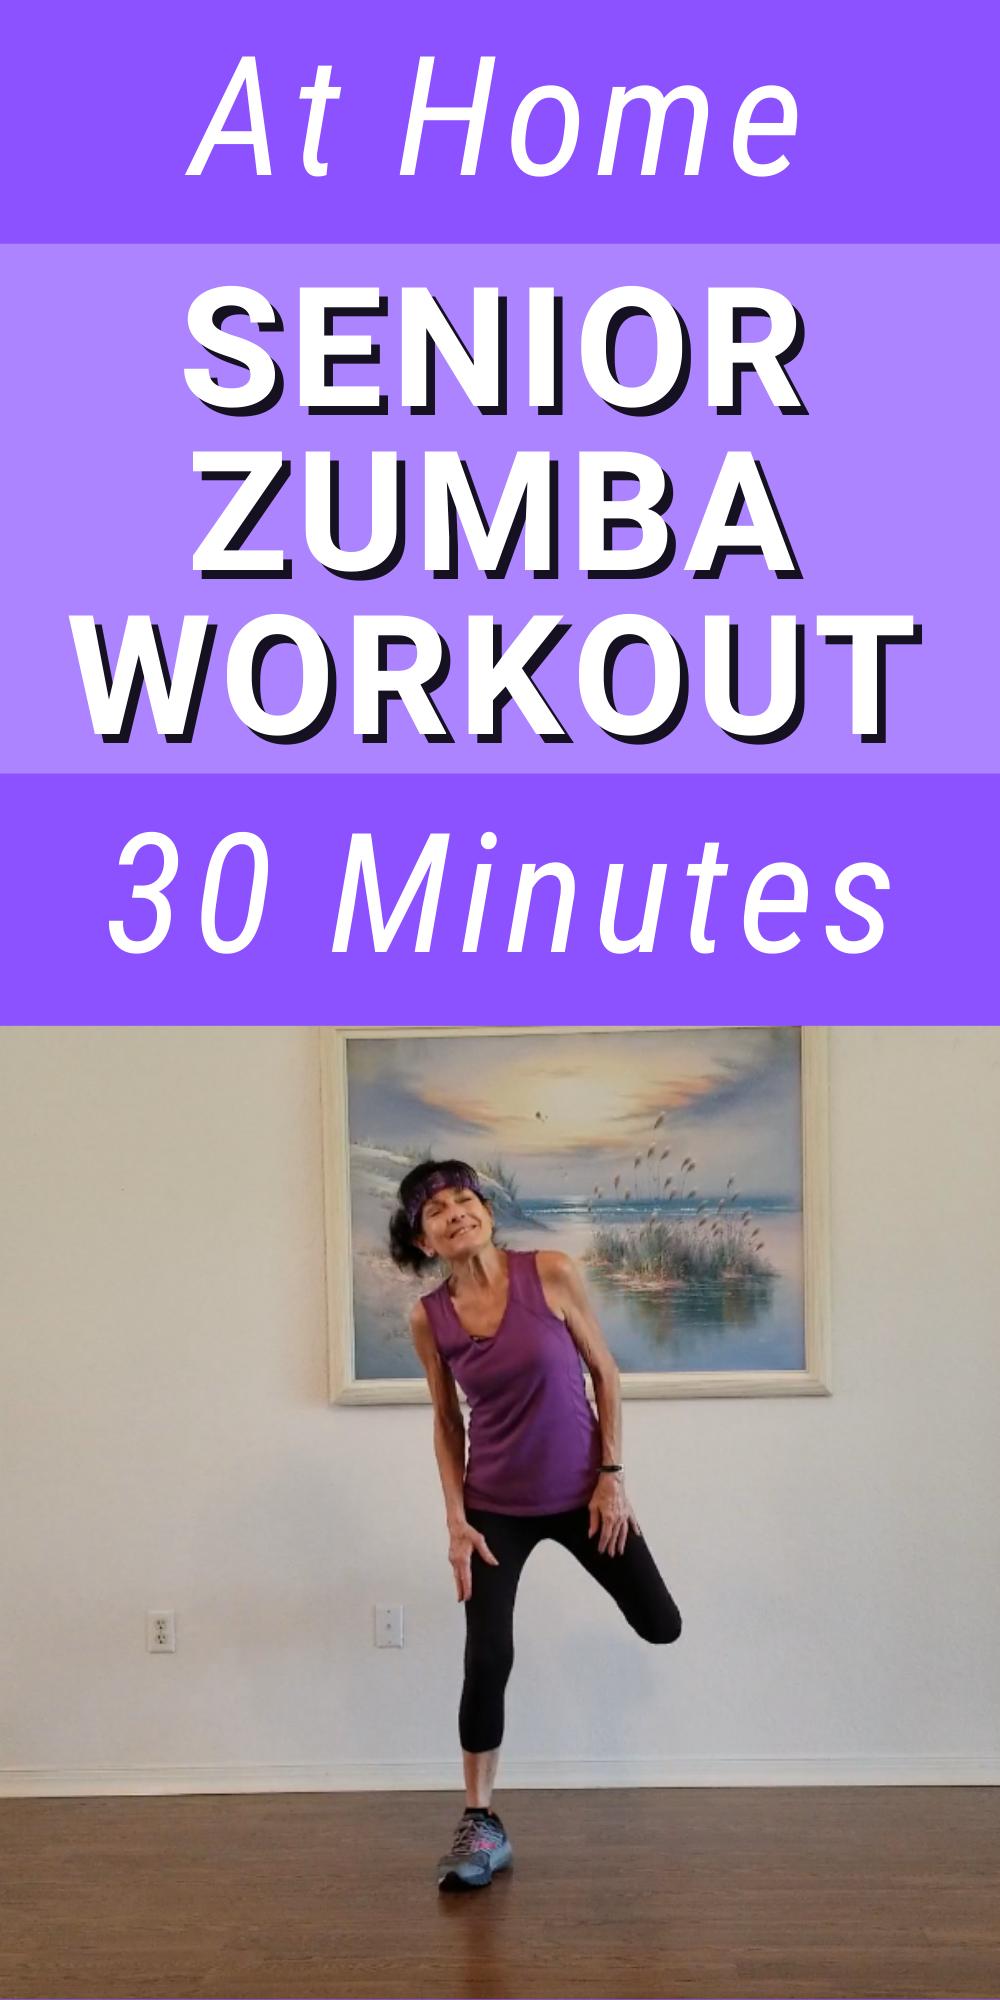 At Home Zumba Workout